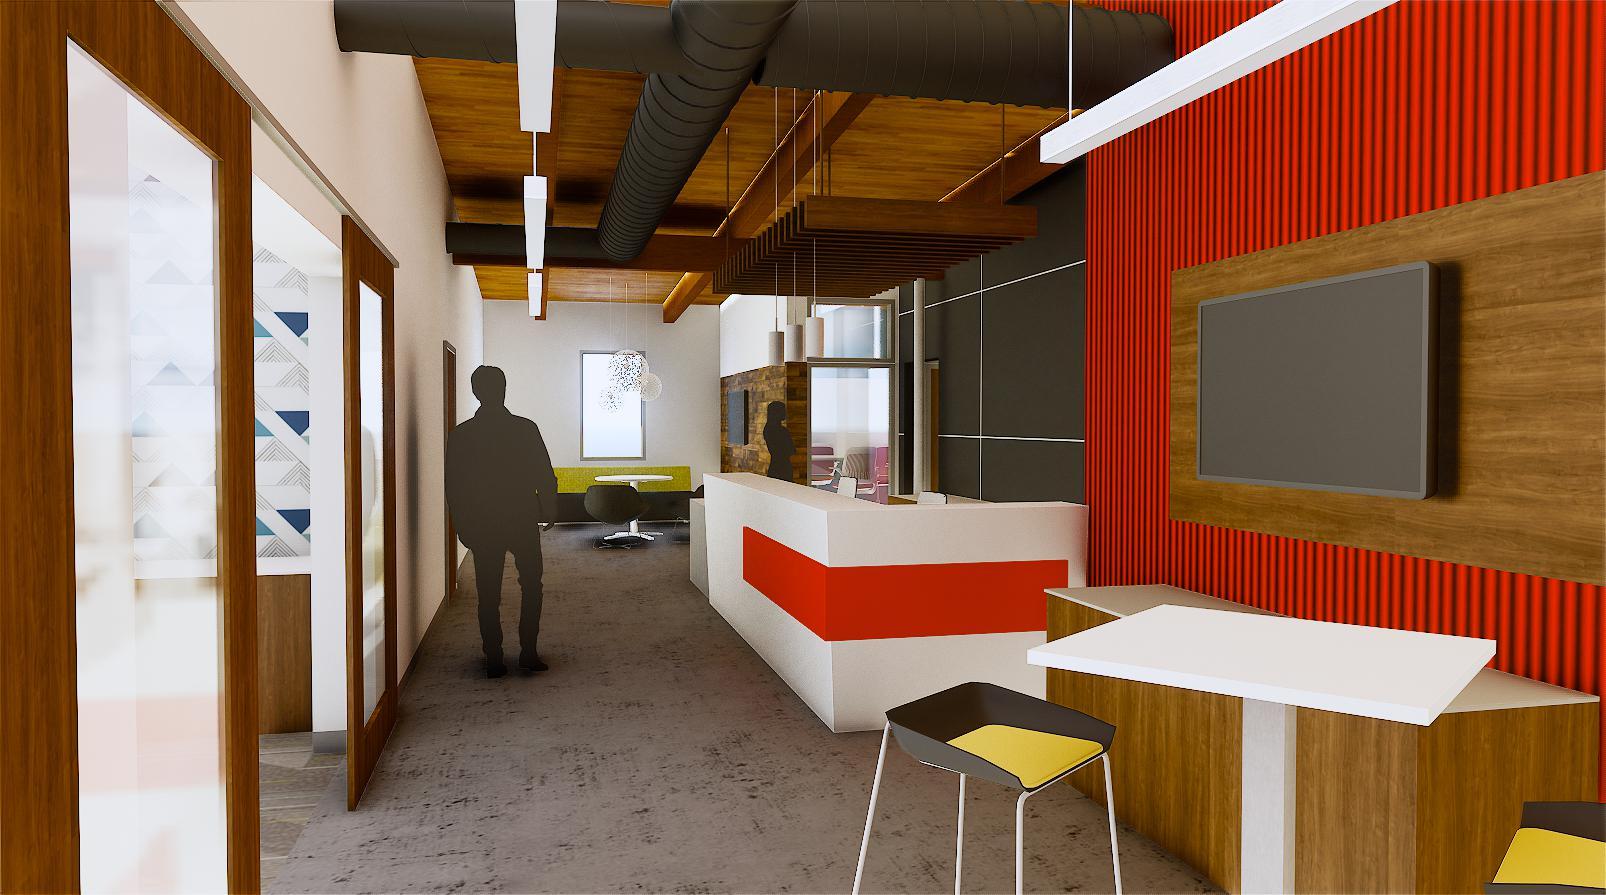 Wightman Kalamazoo reception area rendering